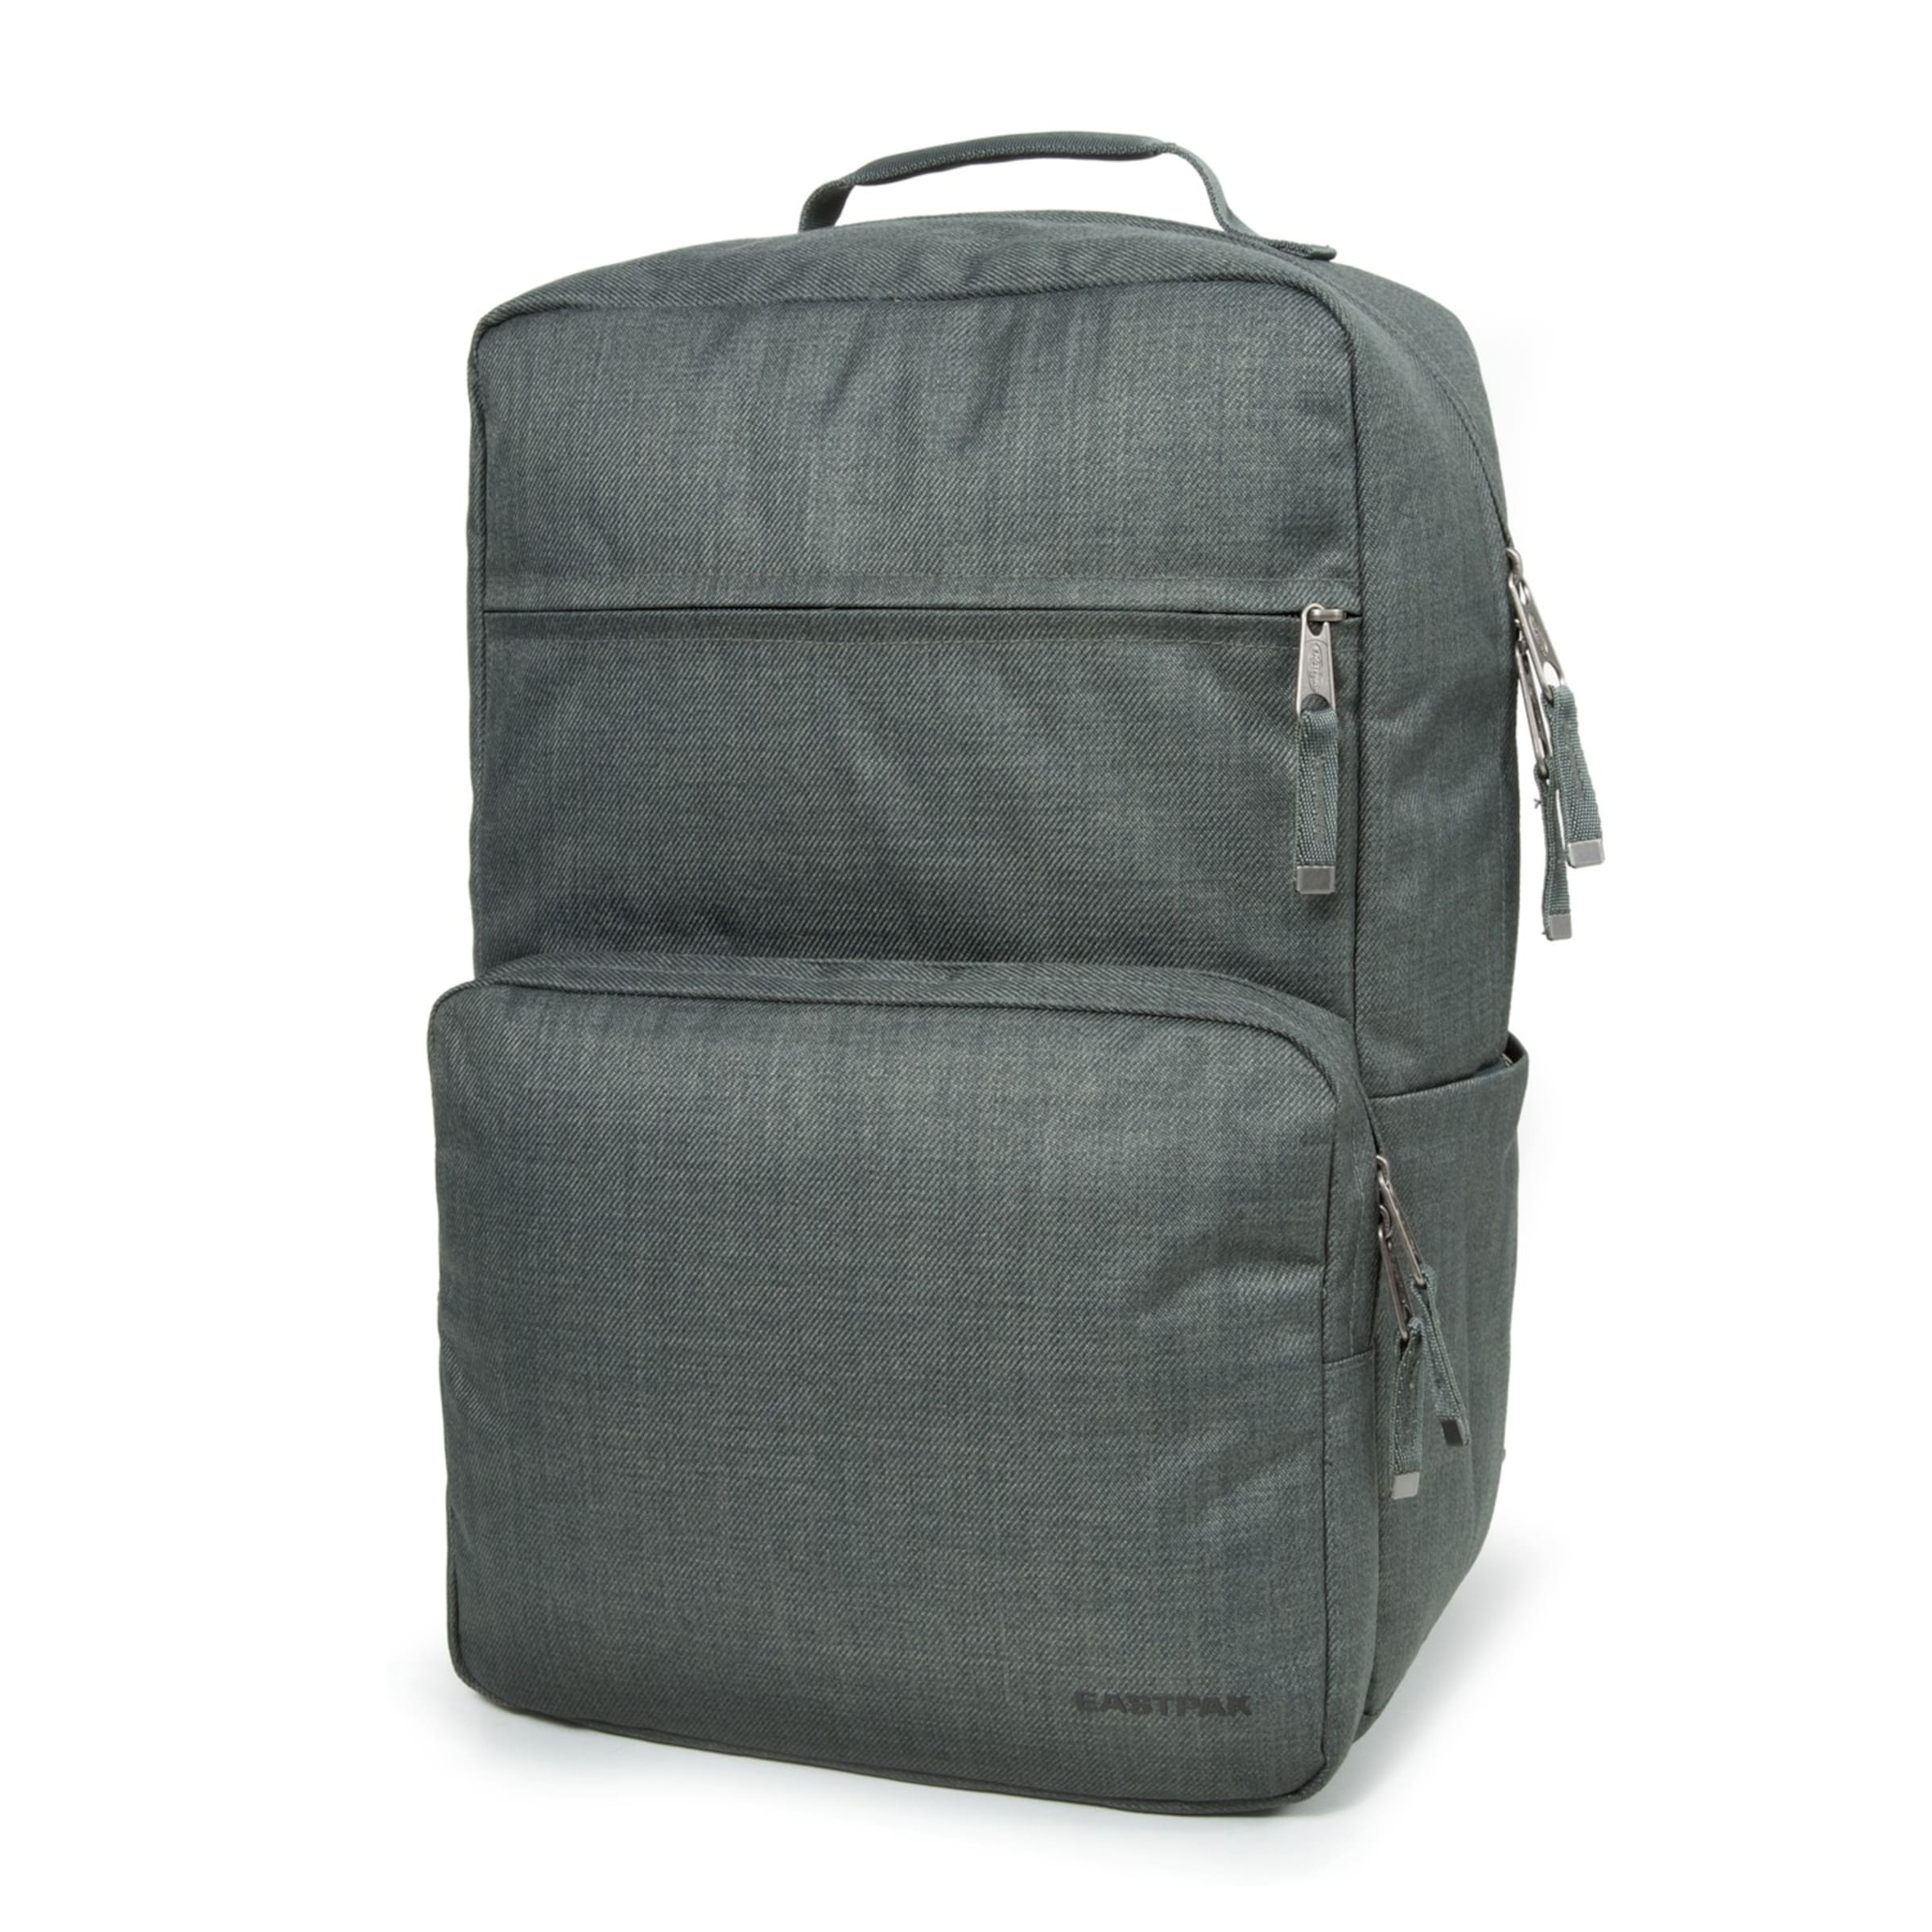 mit Collection cm Rucksack Laptopfach 45 EASTPAK EASTPAK Authentic Authentic Keelee aqwx1Otn8R